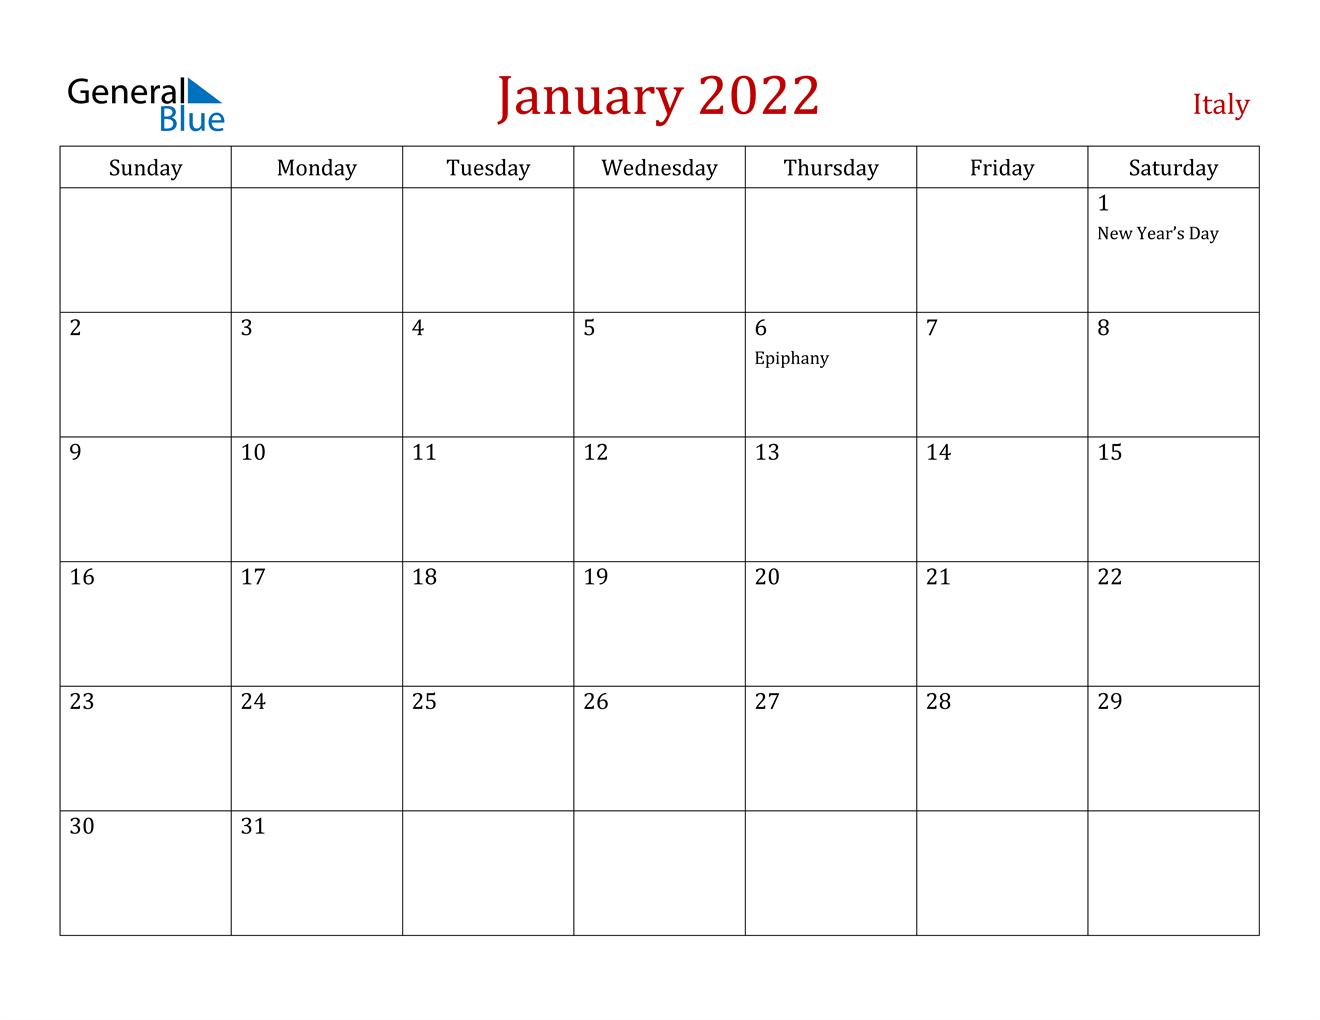 January 2022 Calendar - Italy